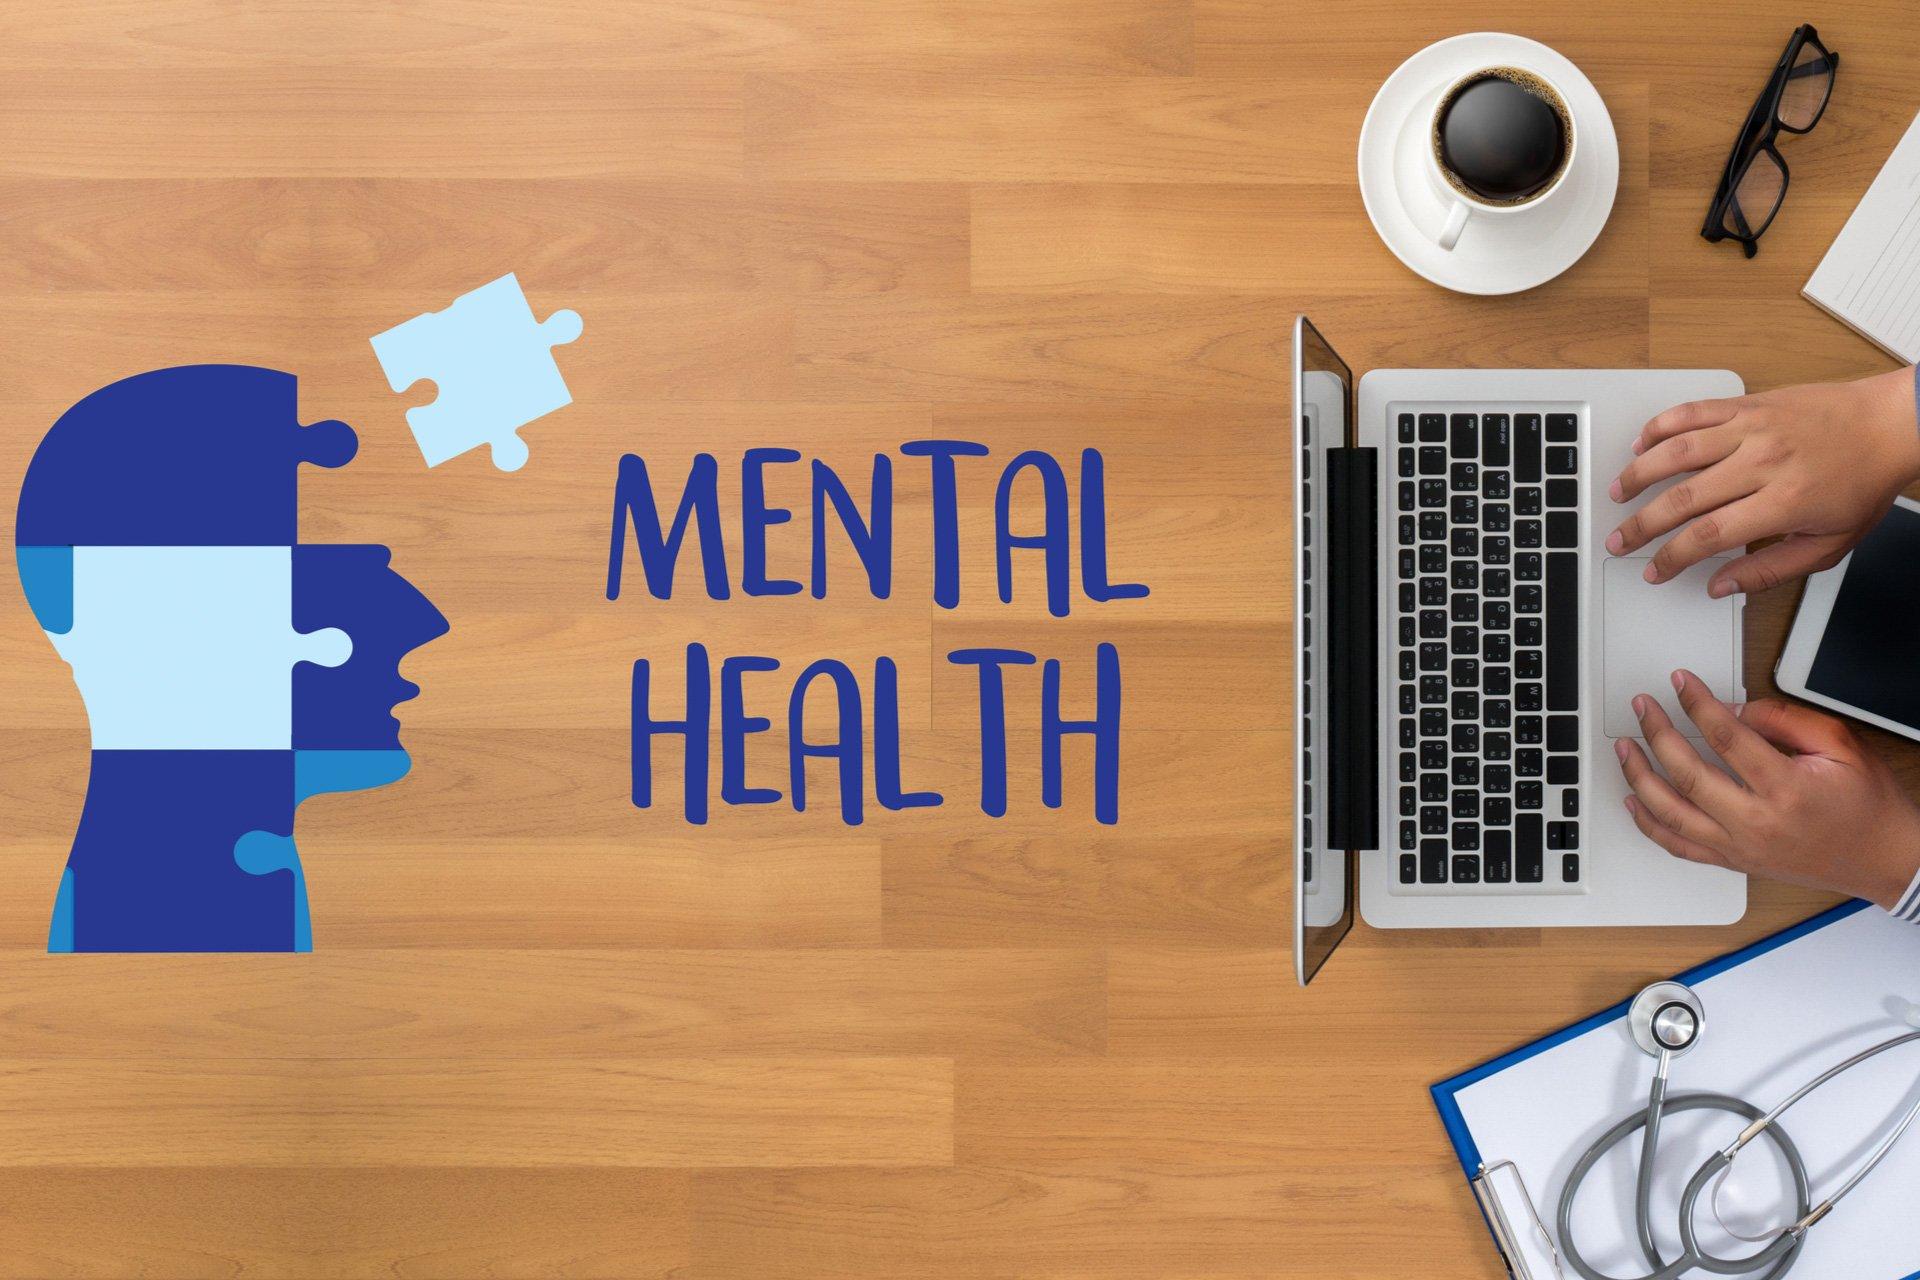 mental health parity